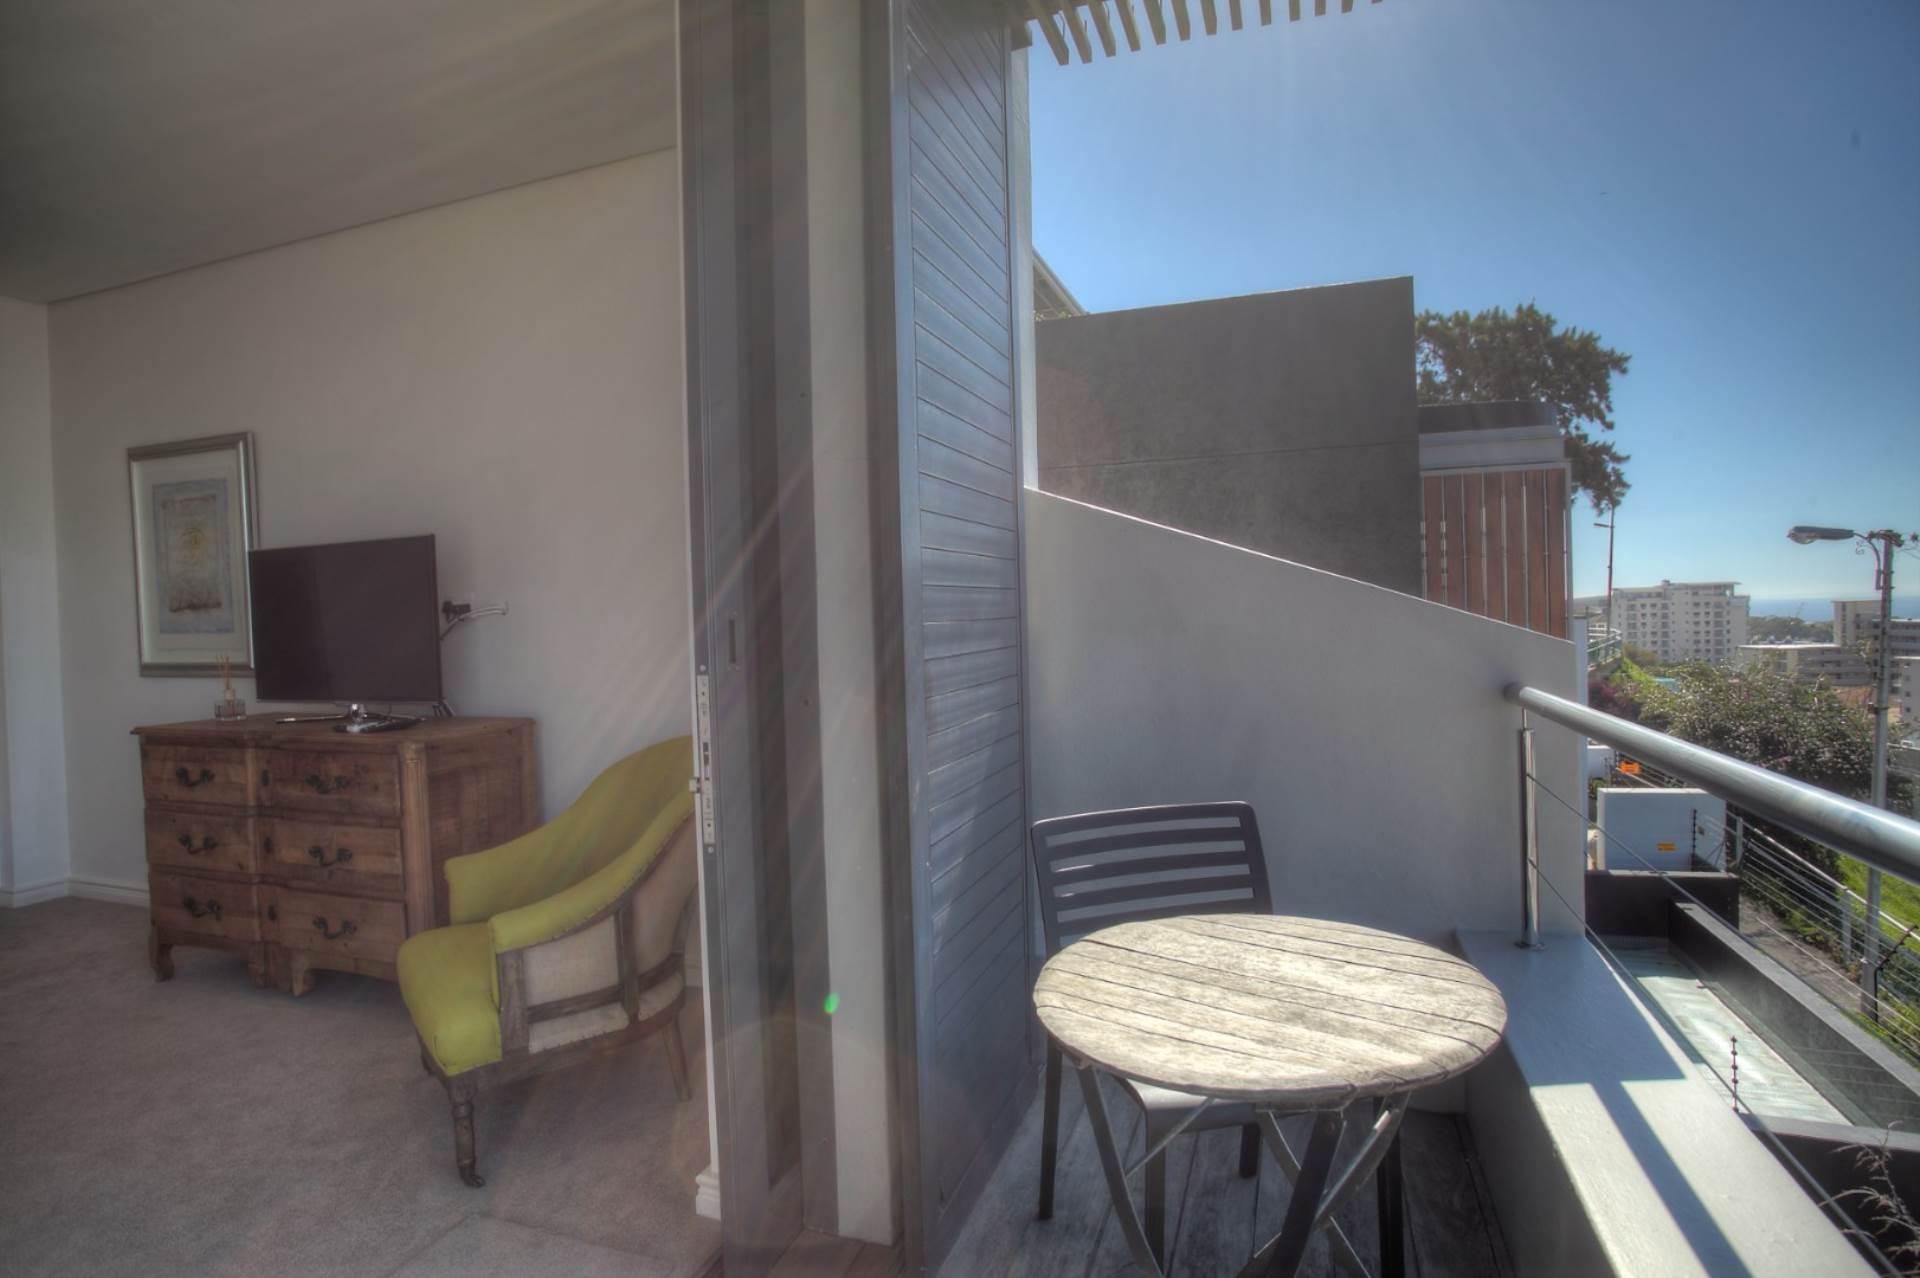 De Waterkant property for sale. Ref No: 13533994. Picture no 21